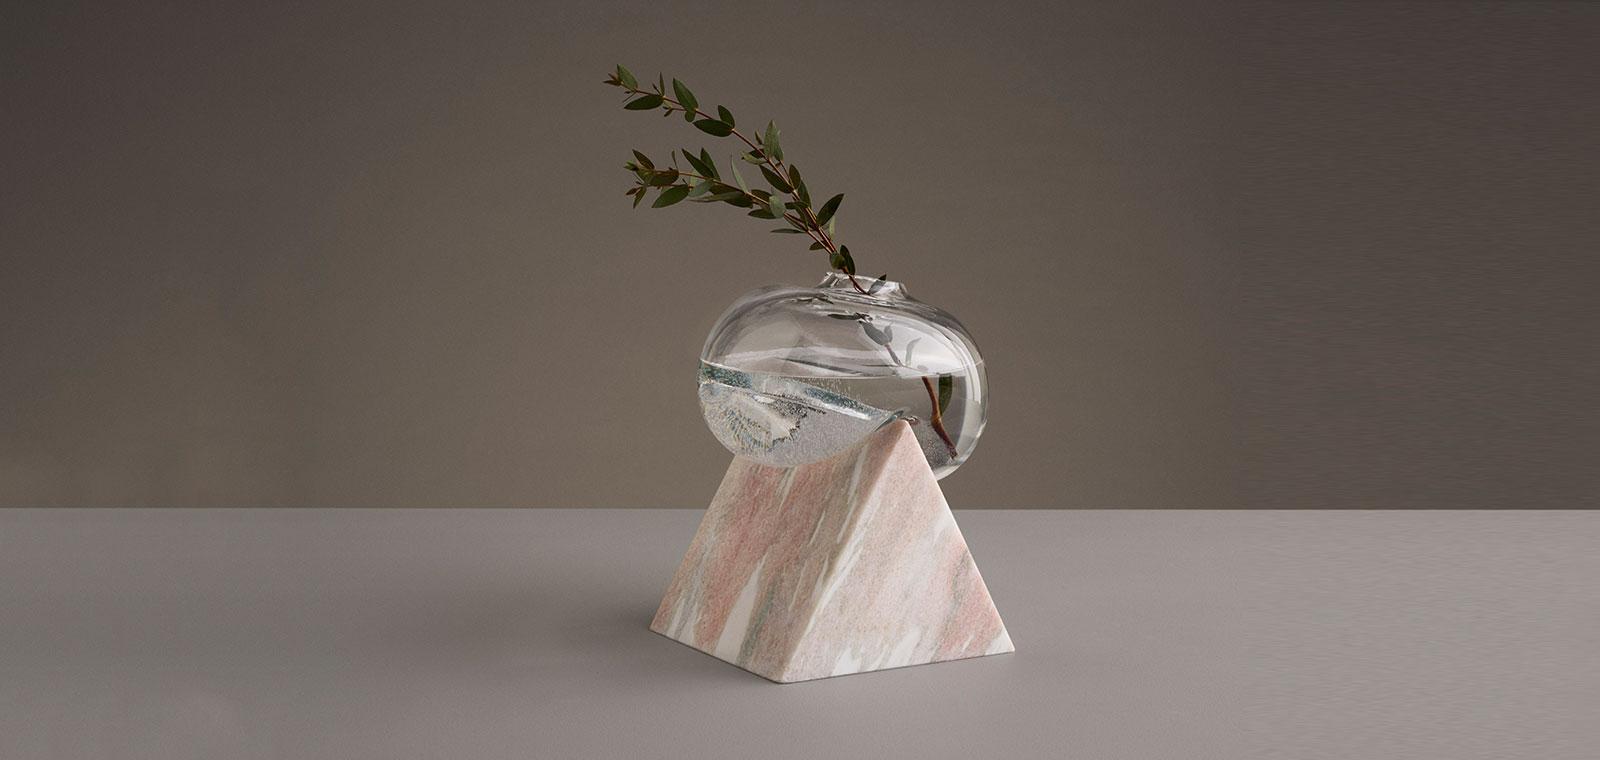 Indefinite vases by Studio E.O beautiful sculptural vases